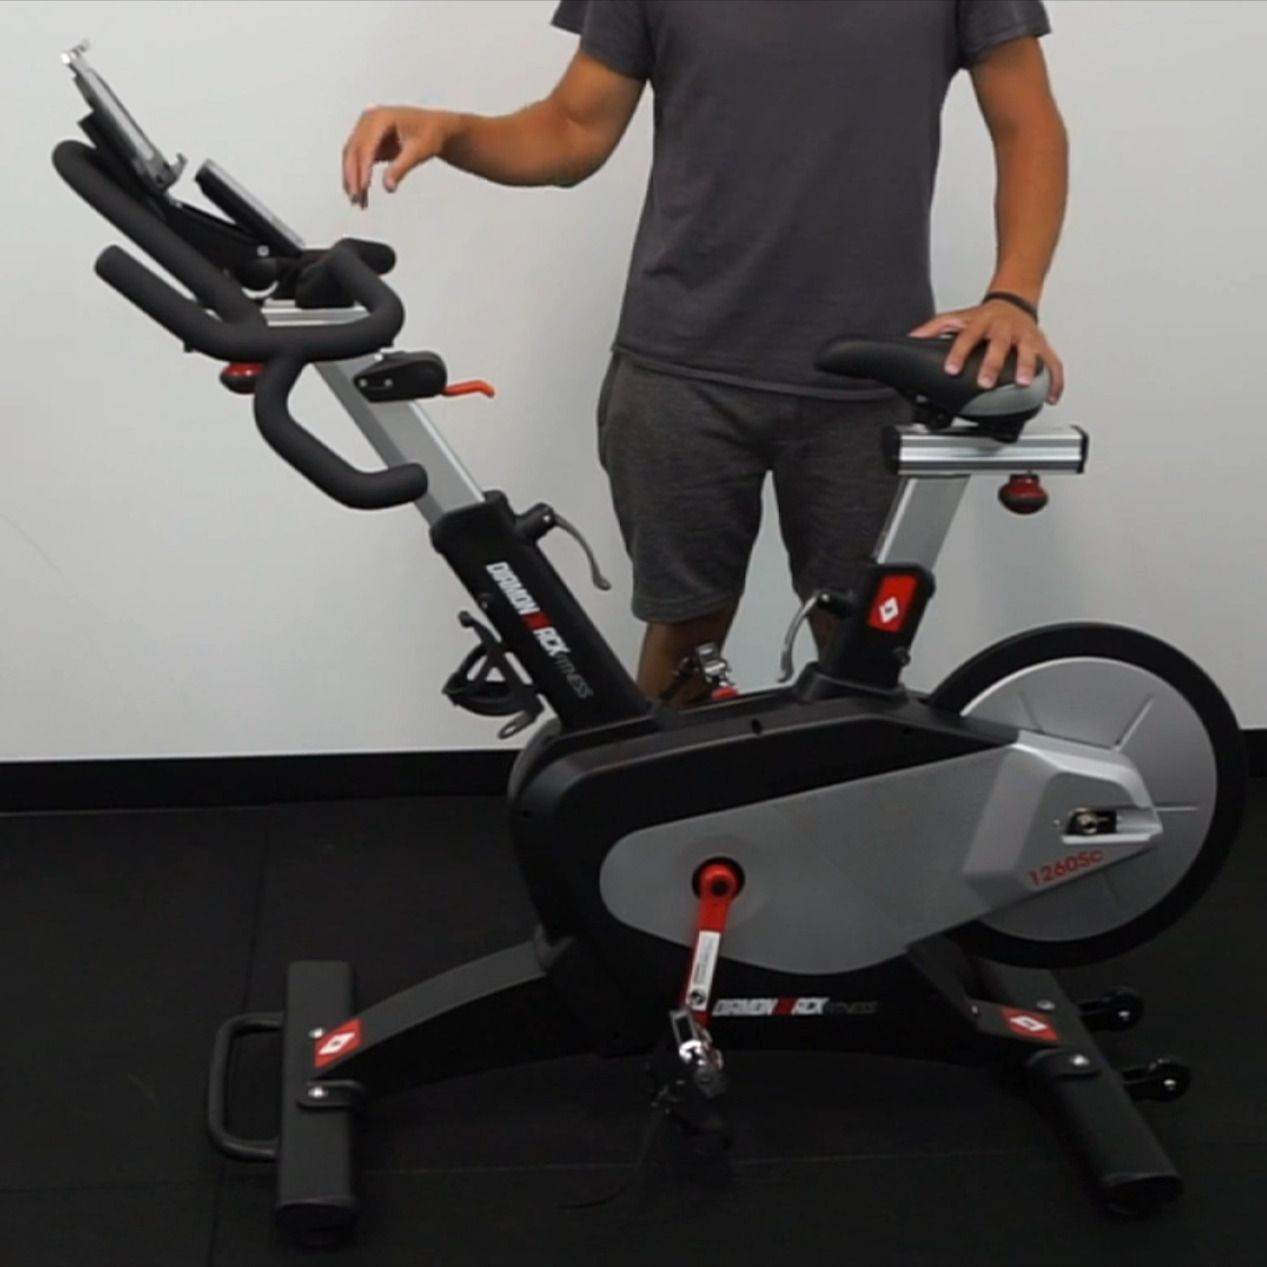 Stationary Near Me Assault Bike Workout Biking Workout Exercise Bikes